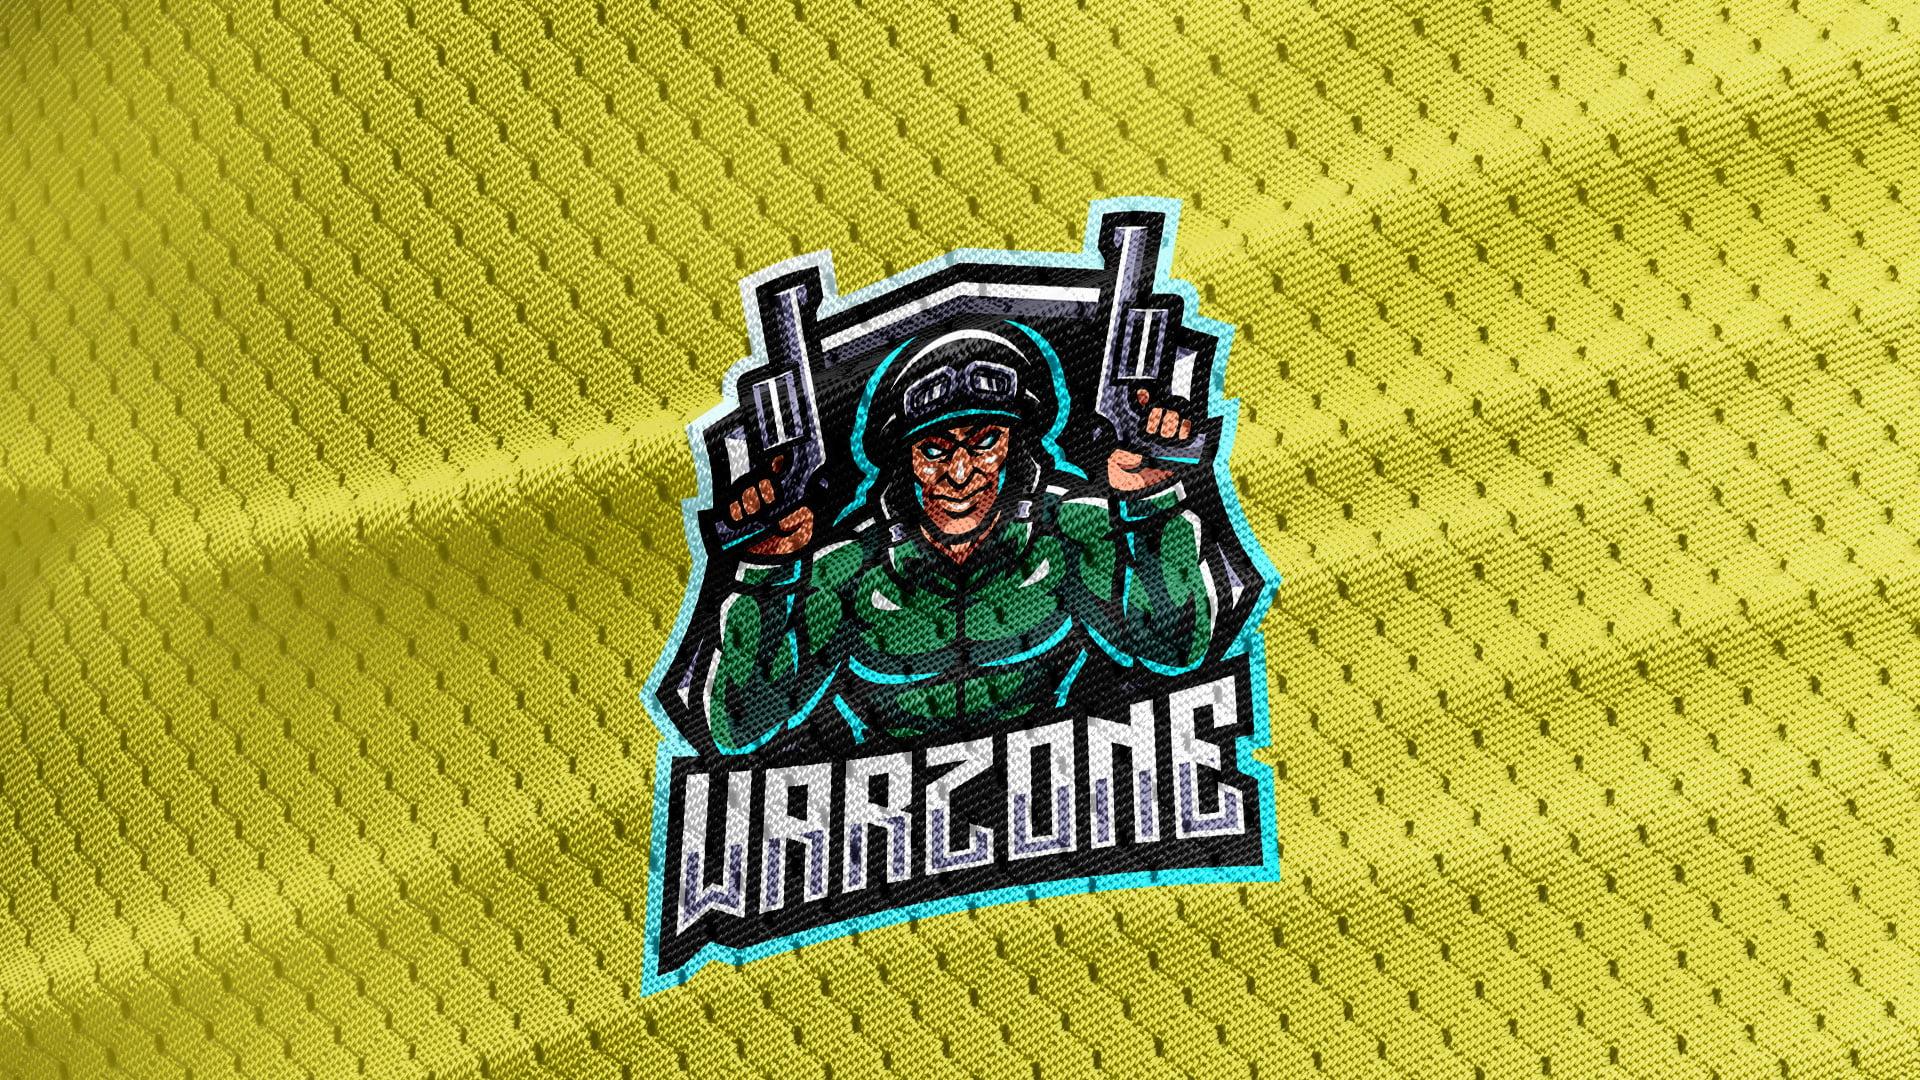 Yellow-Jersey-Texture-Free-Downloads-Warzone-Gaming-Mascot-Logo